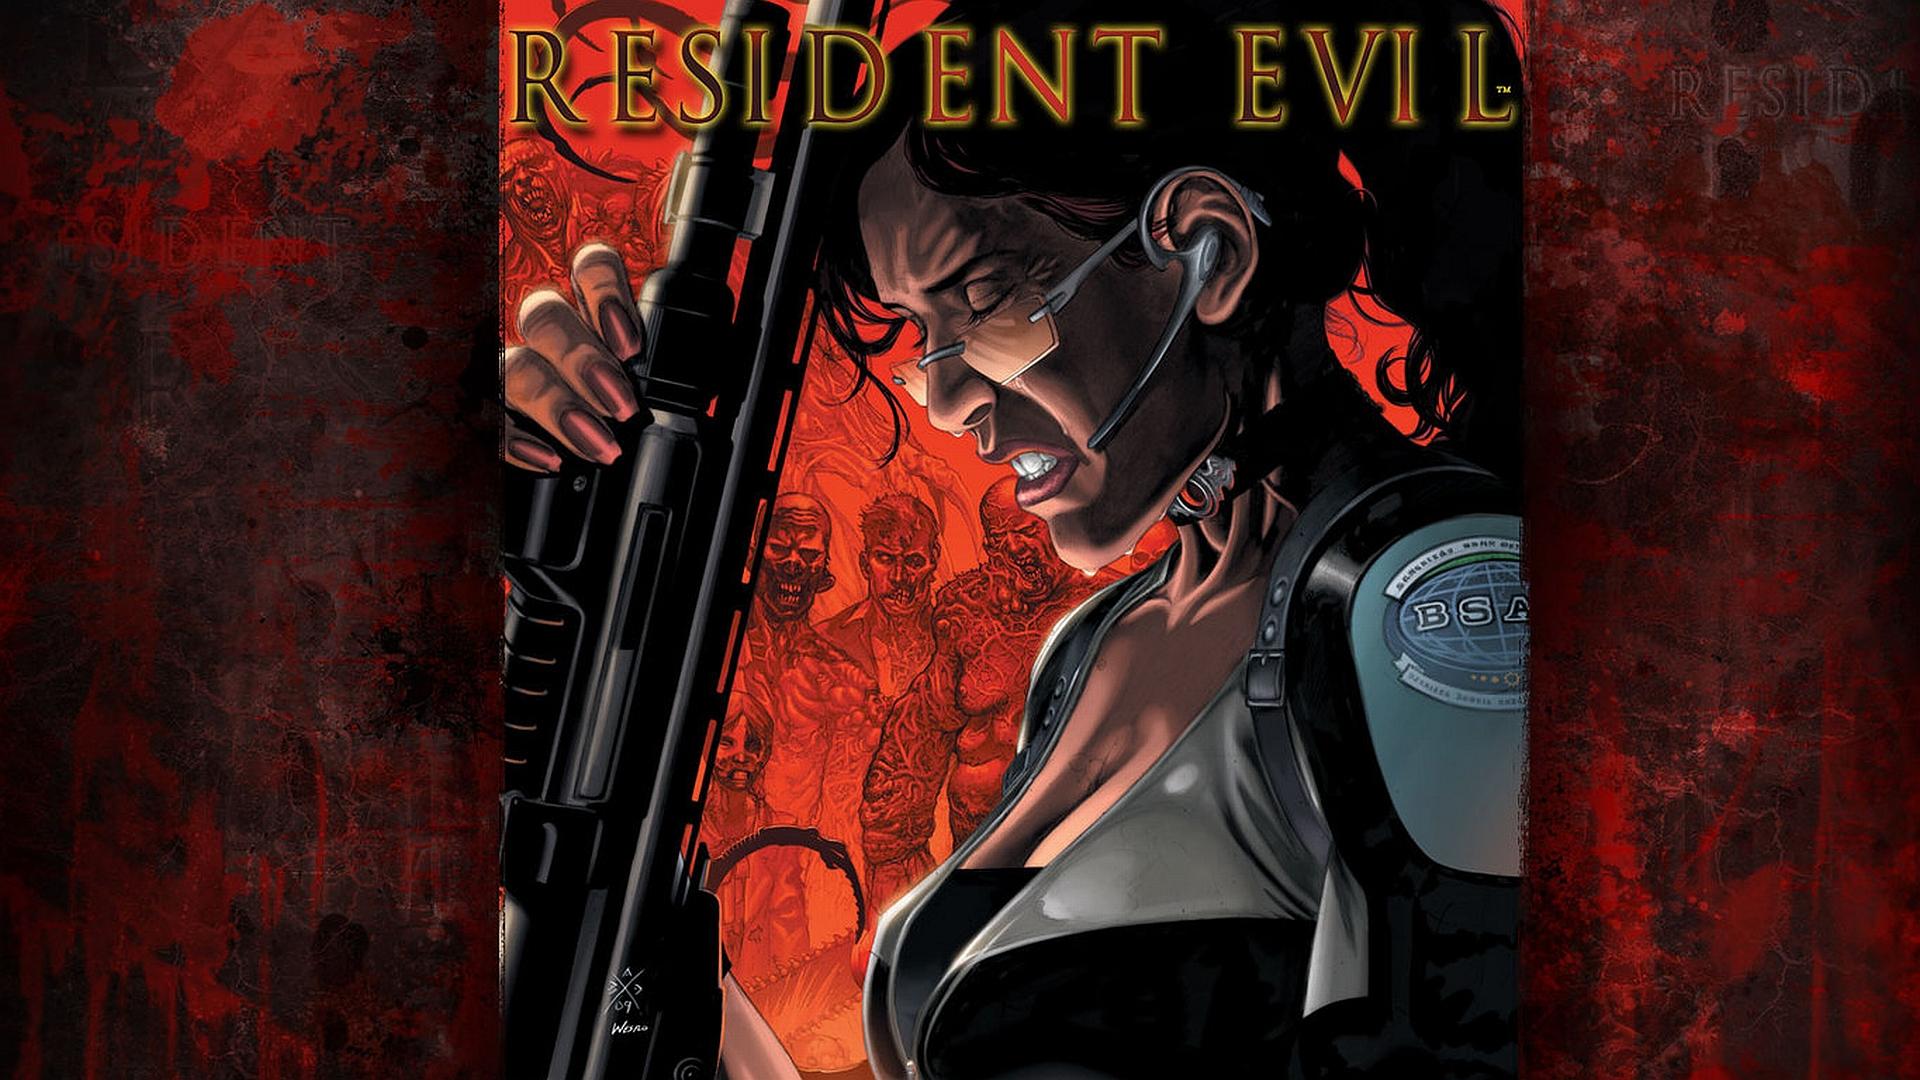 Resident Evil HD Wallpaper | Background Image | 1920x1080 ...